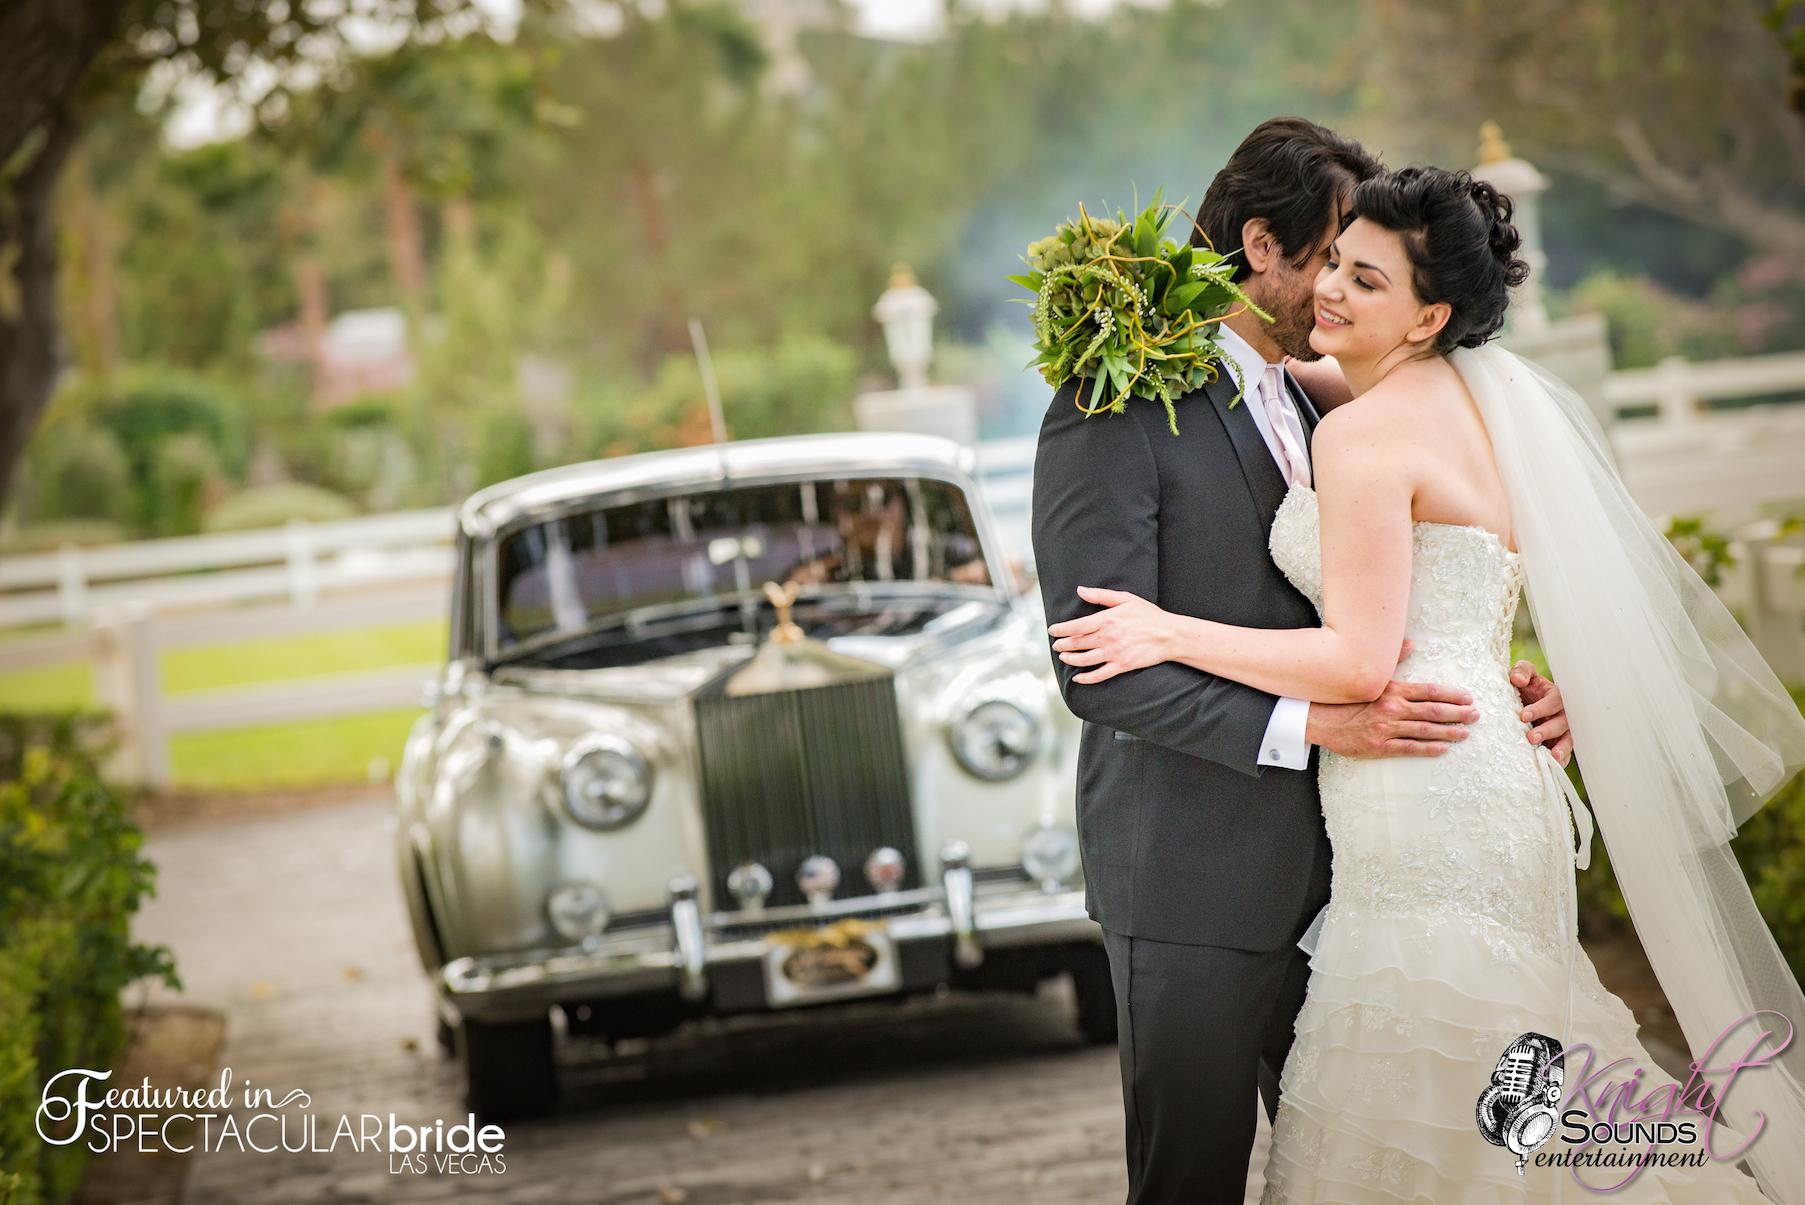 Spectacular Bride Magazine_KSE-25-2